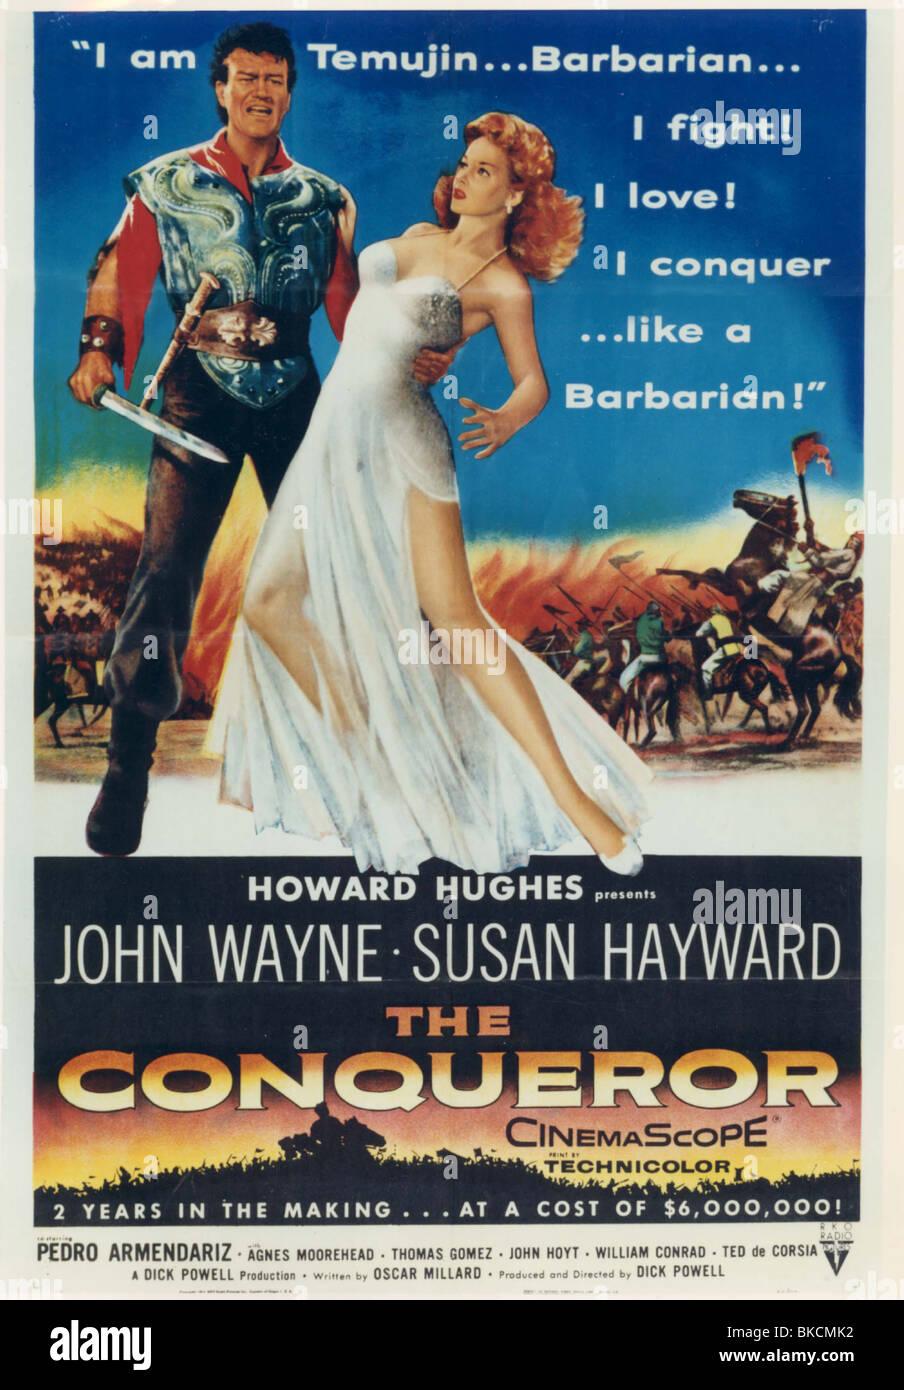 THE CONQUEROR -1955 POSTER - Stock Image